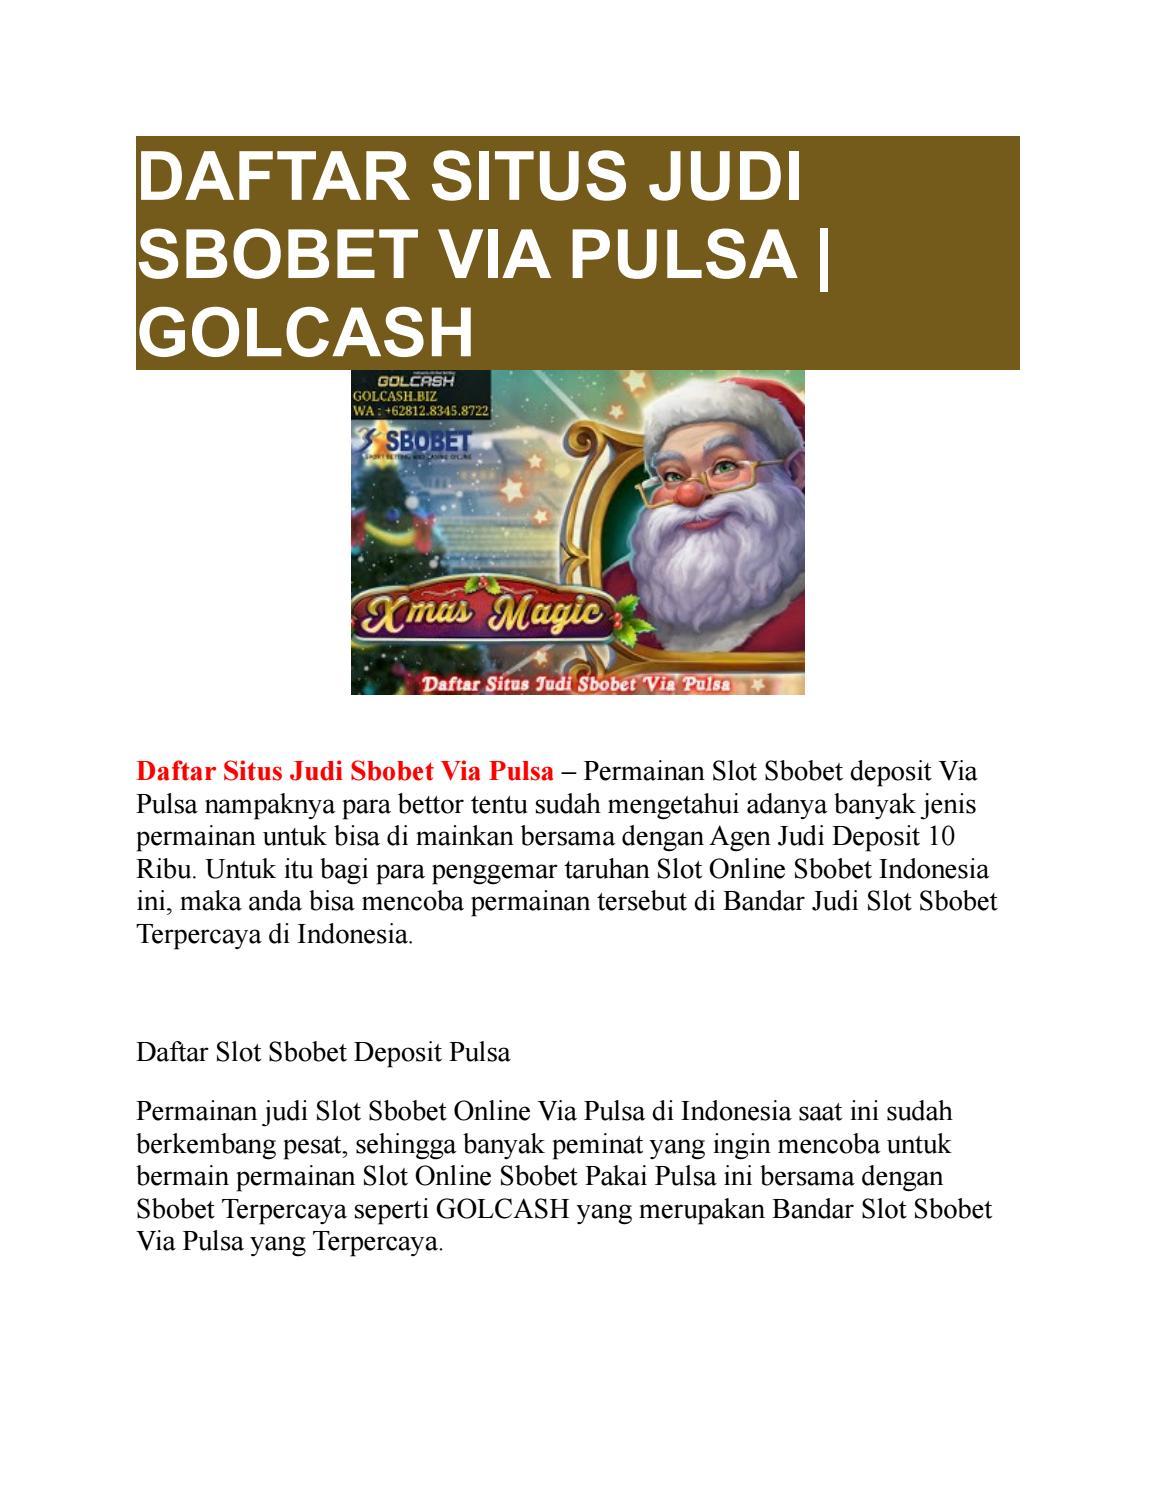 Daftar Situs Judi Sbobet Via Pulsa Golcash By Golcash Issuu